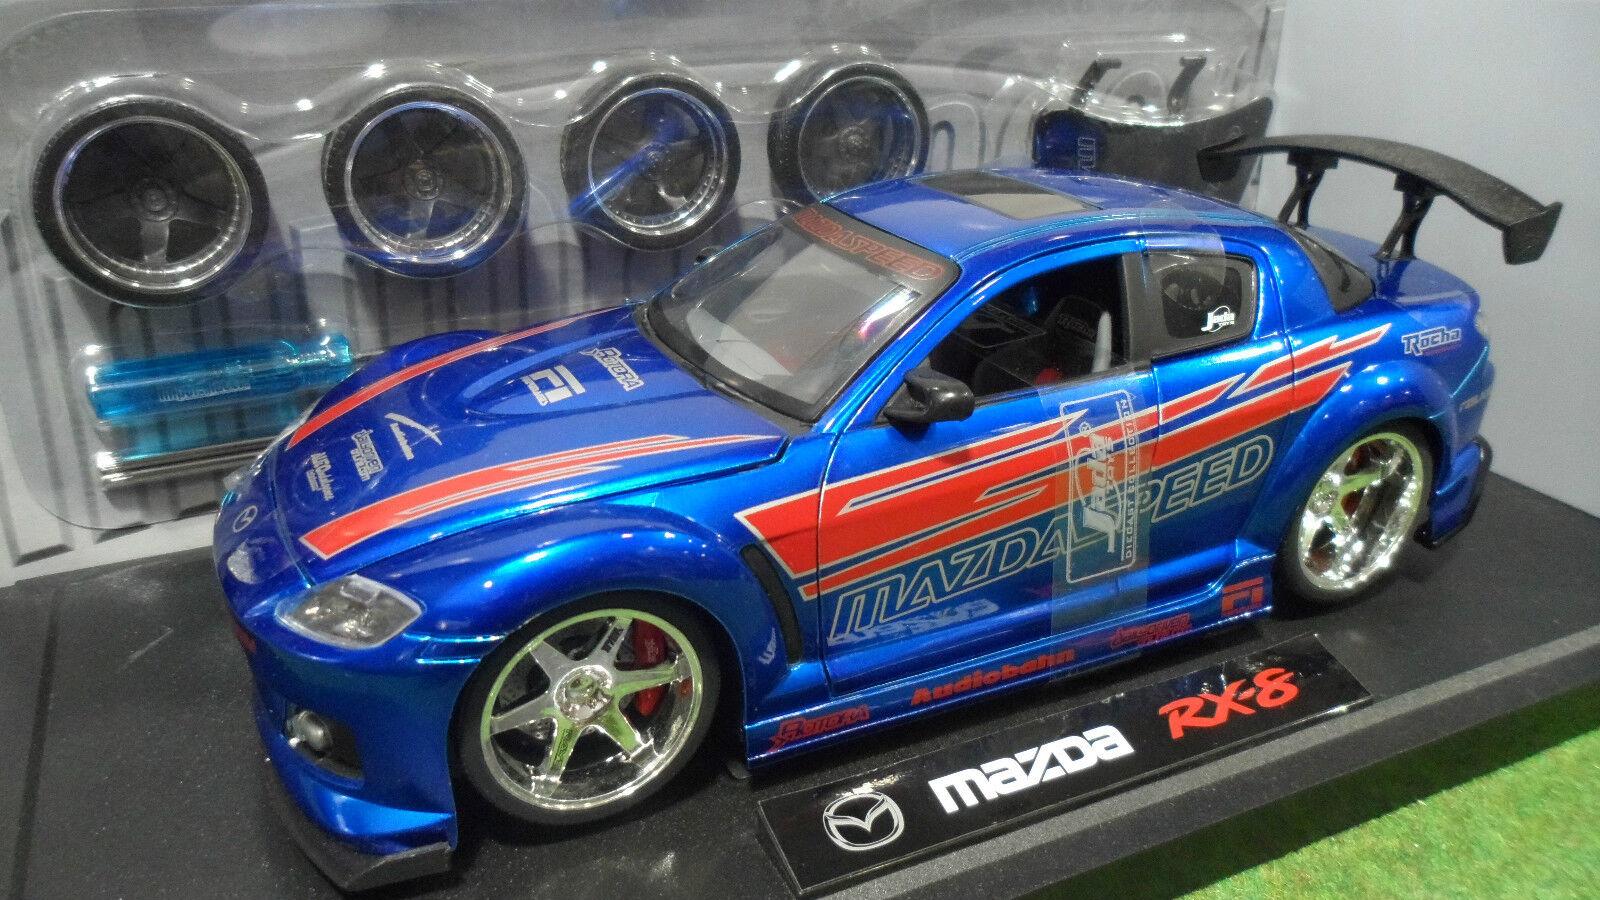 MAZDA RX-8 TUNING Bleu au 1 18 JADATOYS IMPORT RACER 63284 voiture miniature